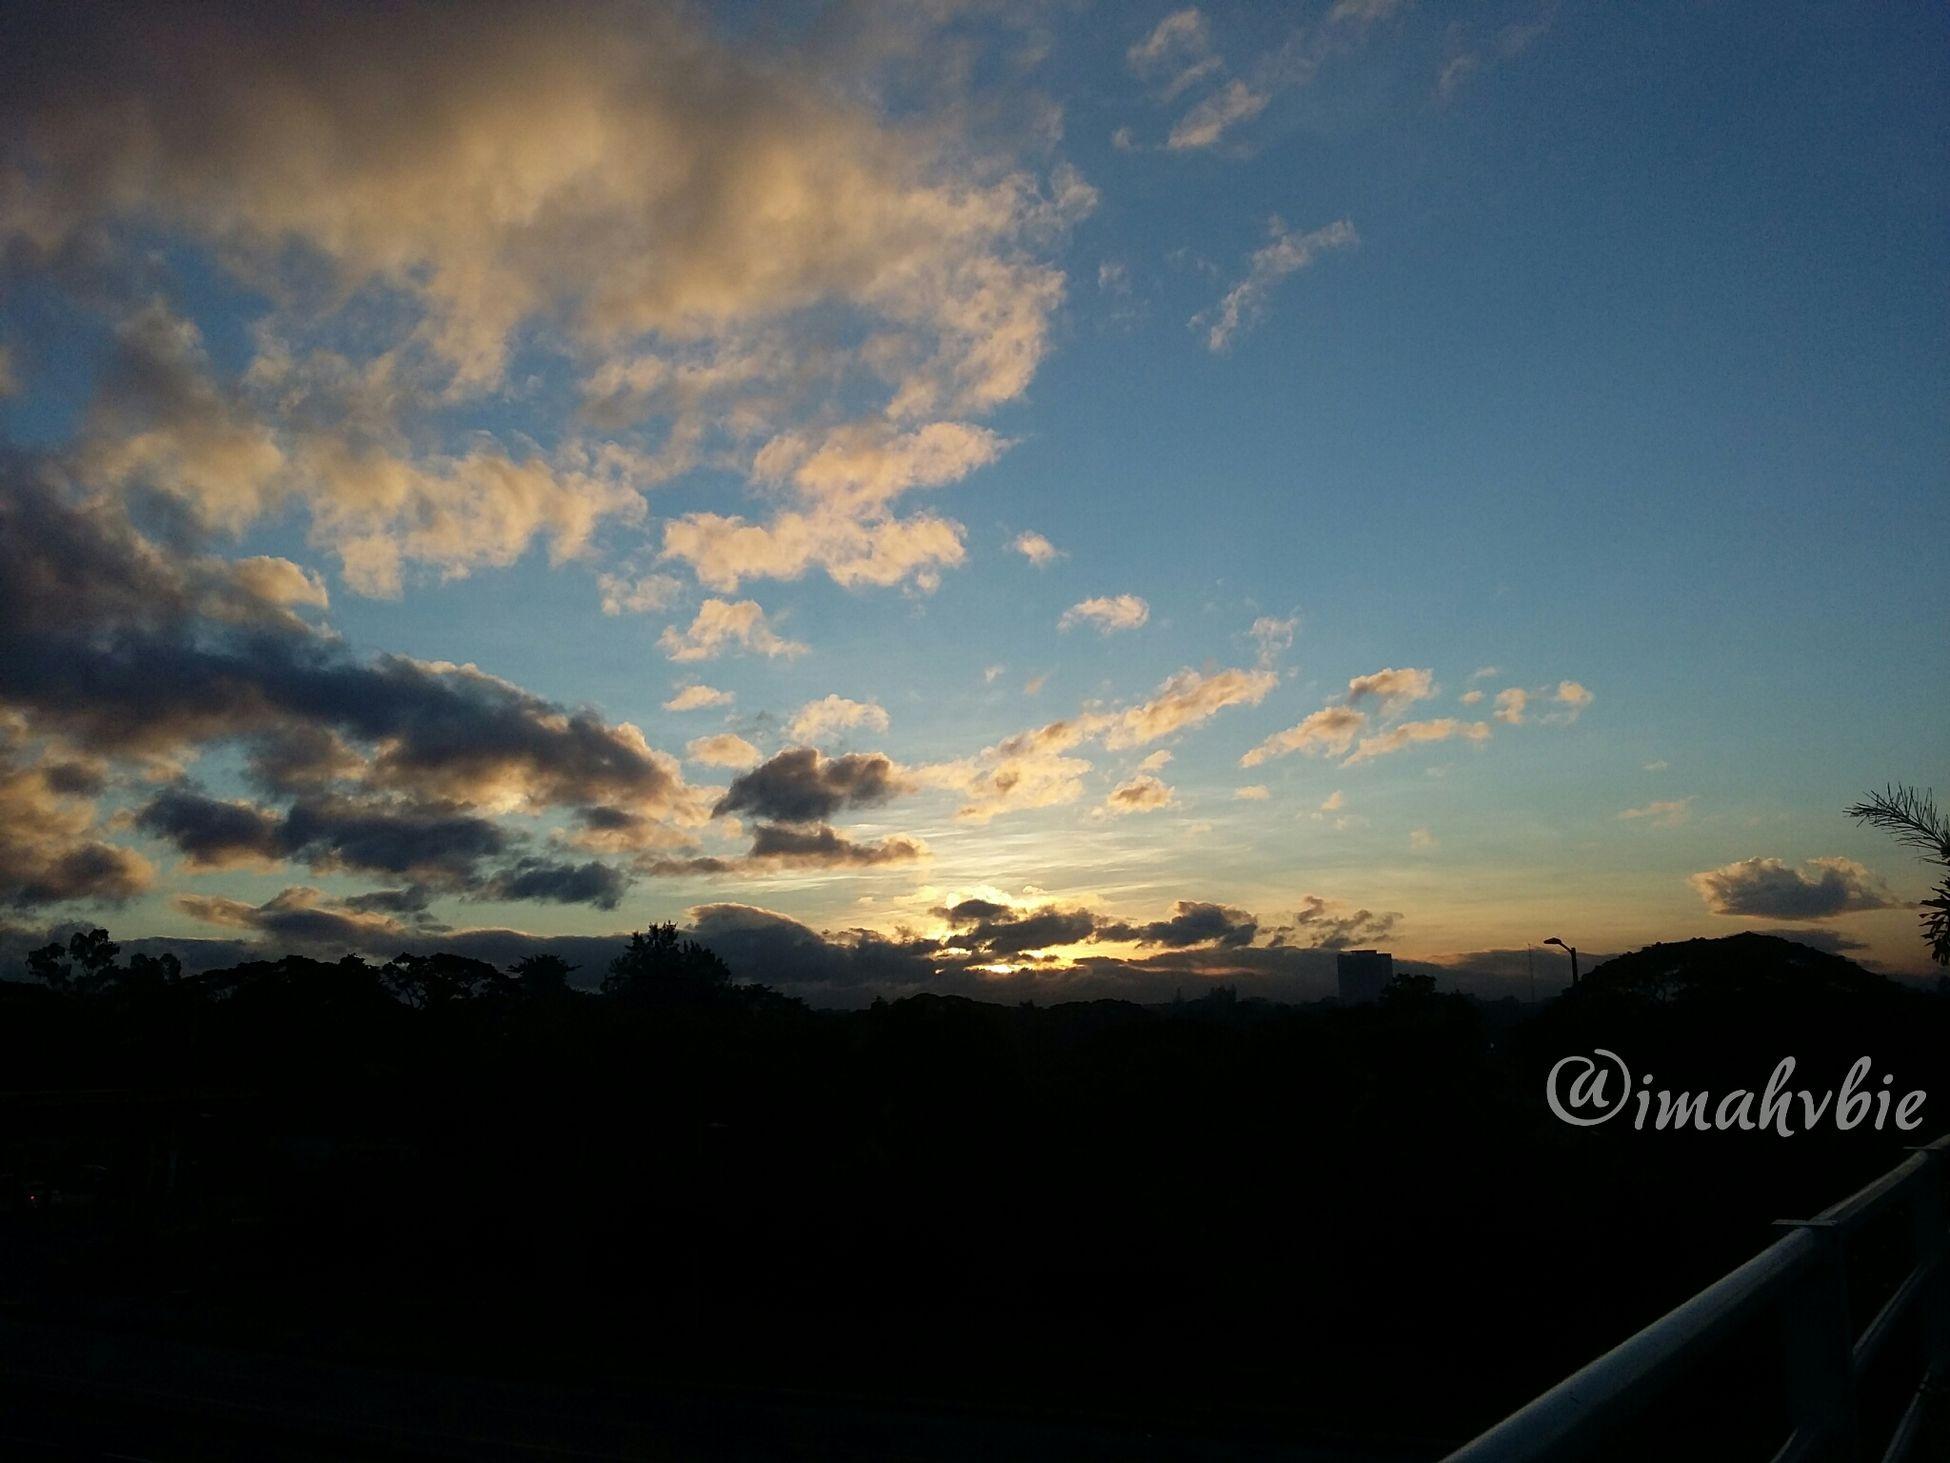 Galaxyprimeshot Sun_collection, Sky_collection, Cloudporn, Skyporn EyeEm Best Shots - Sunsets + Sunrise Cloudporn